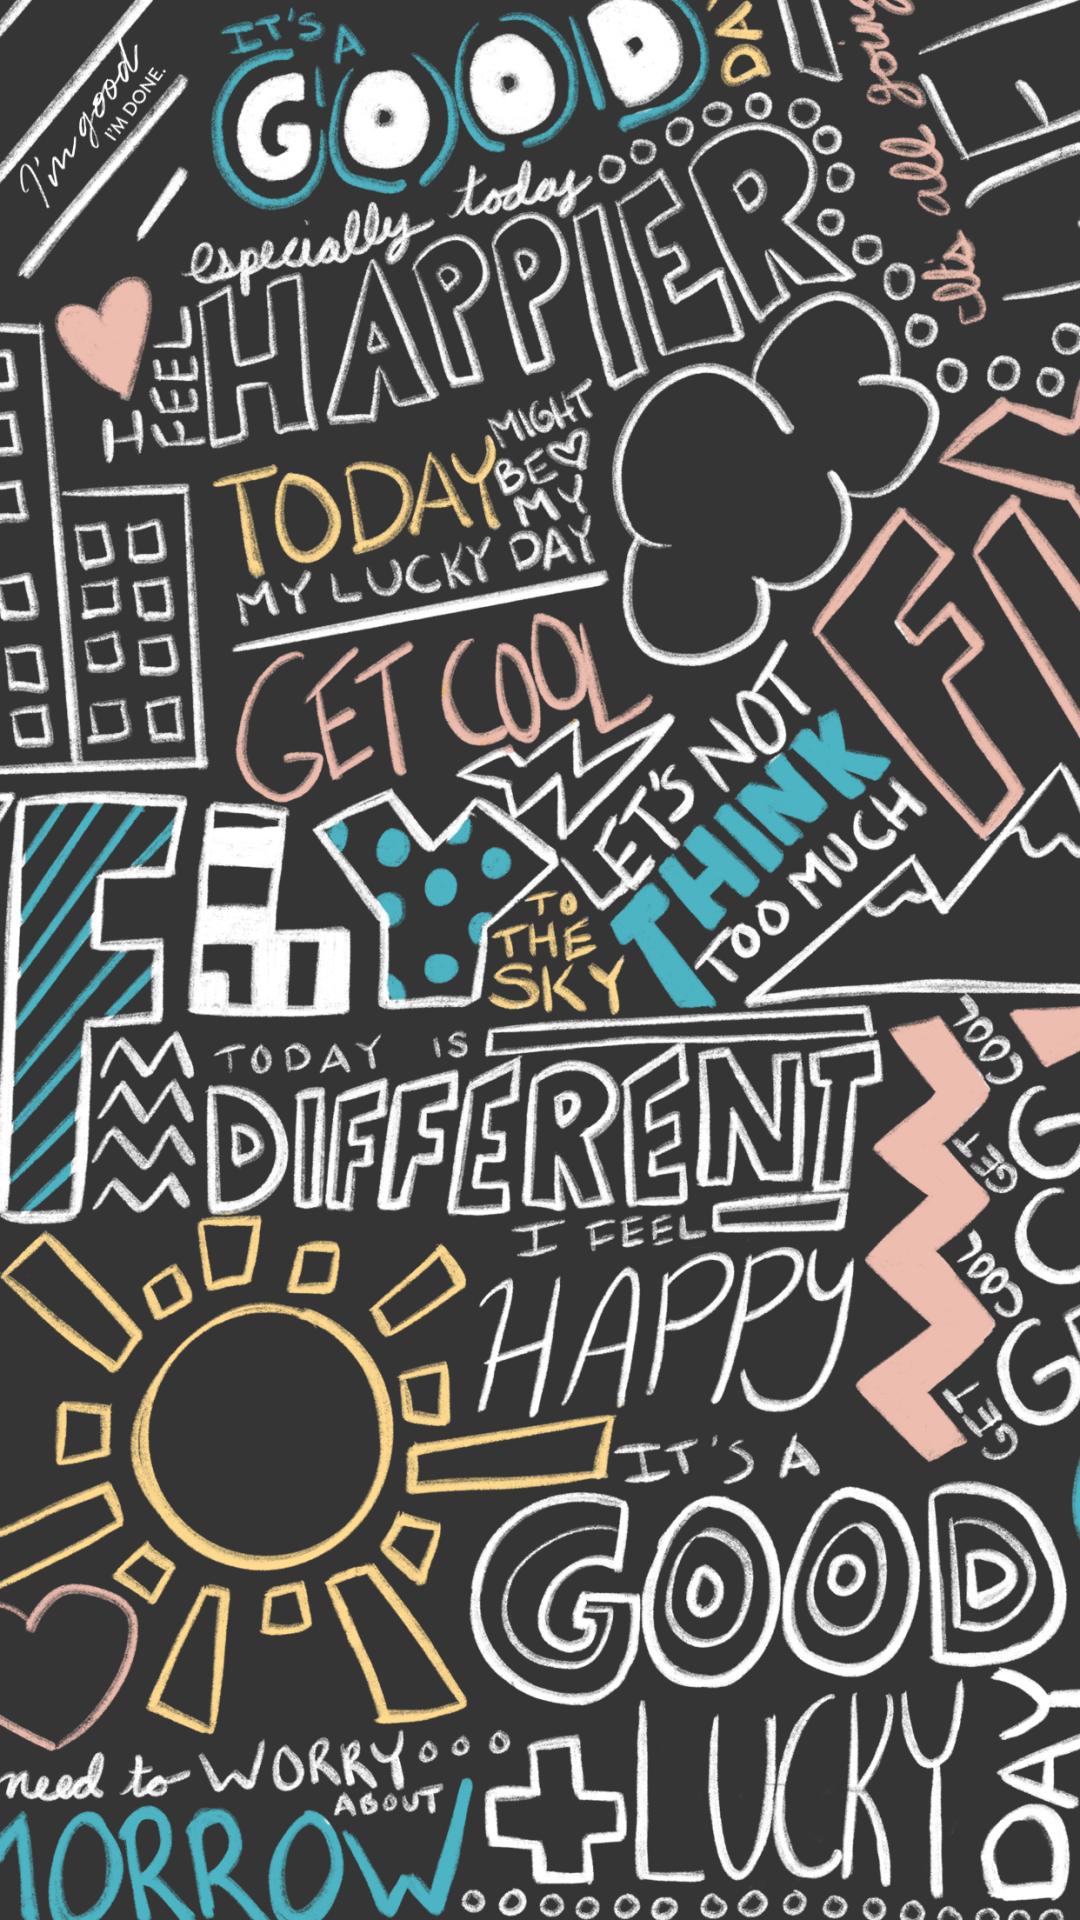 Stray Kids Get Cool Lyrics For Lockscreen Use Only Do Not Remove Watermark Seni Kreatif Wallpaper Lucu